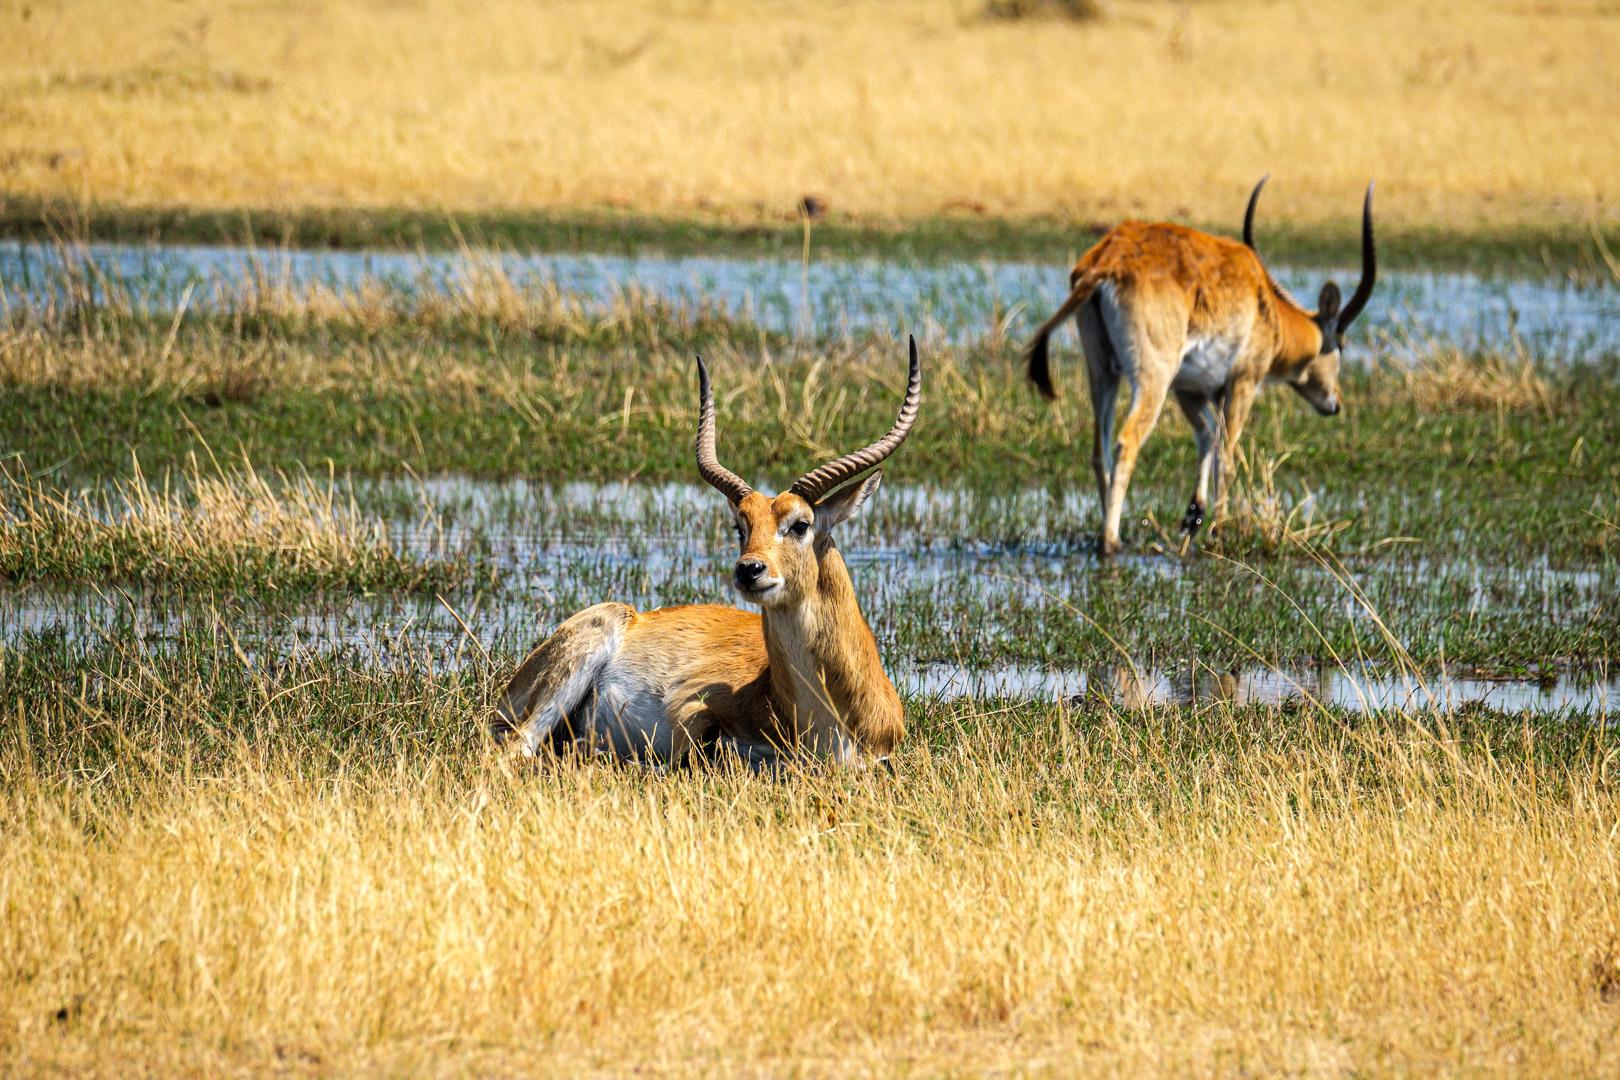 Afrika 2019 – Tierwelt, Antilopen